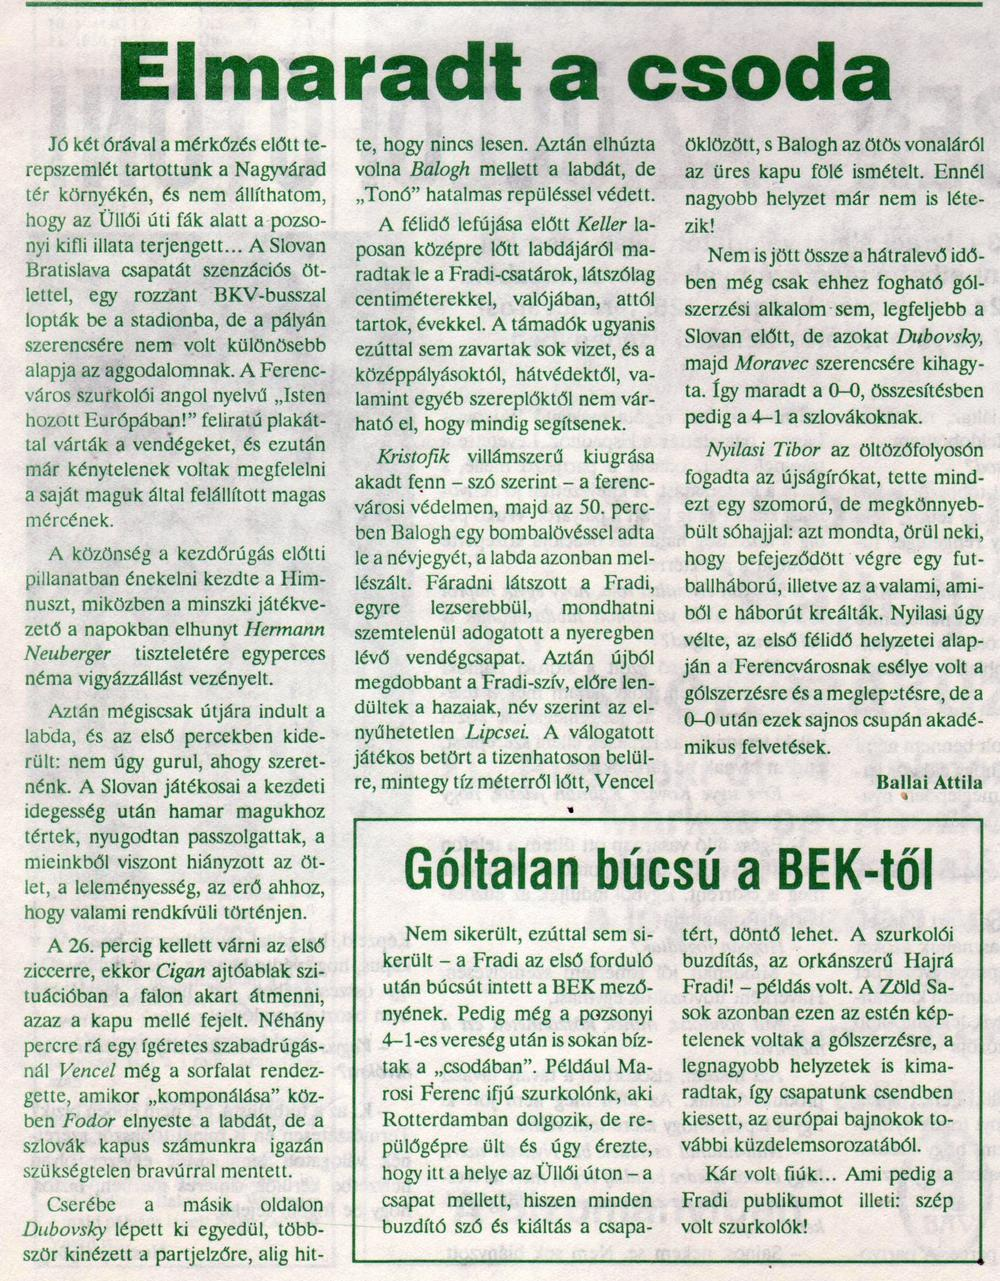 TFU_19920923_FU-Zs_013 - 0002